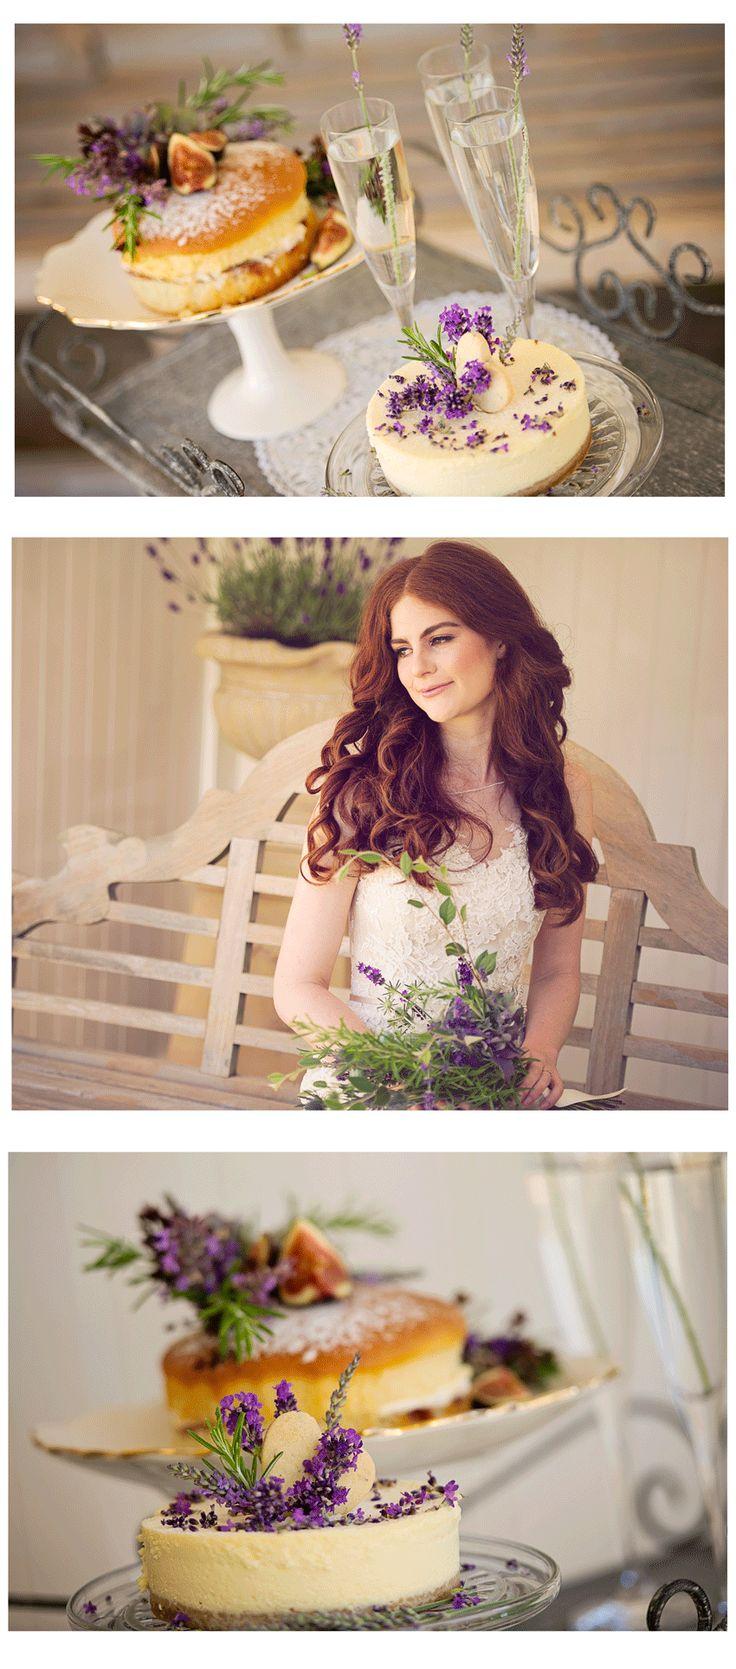 The 25 best periwinkle bridesmaid dresses ideas on pinterest dusty blue periwinkle bridesmaid dresses flower girl dresses to match colour feature ombrellifo Images